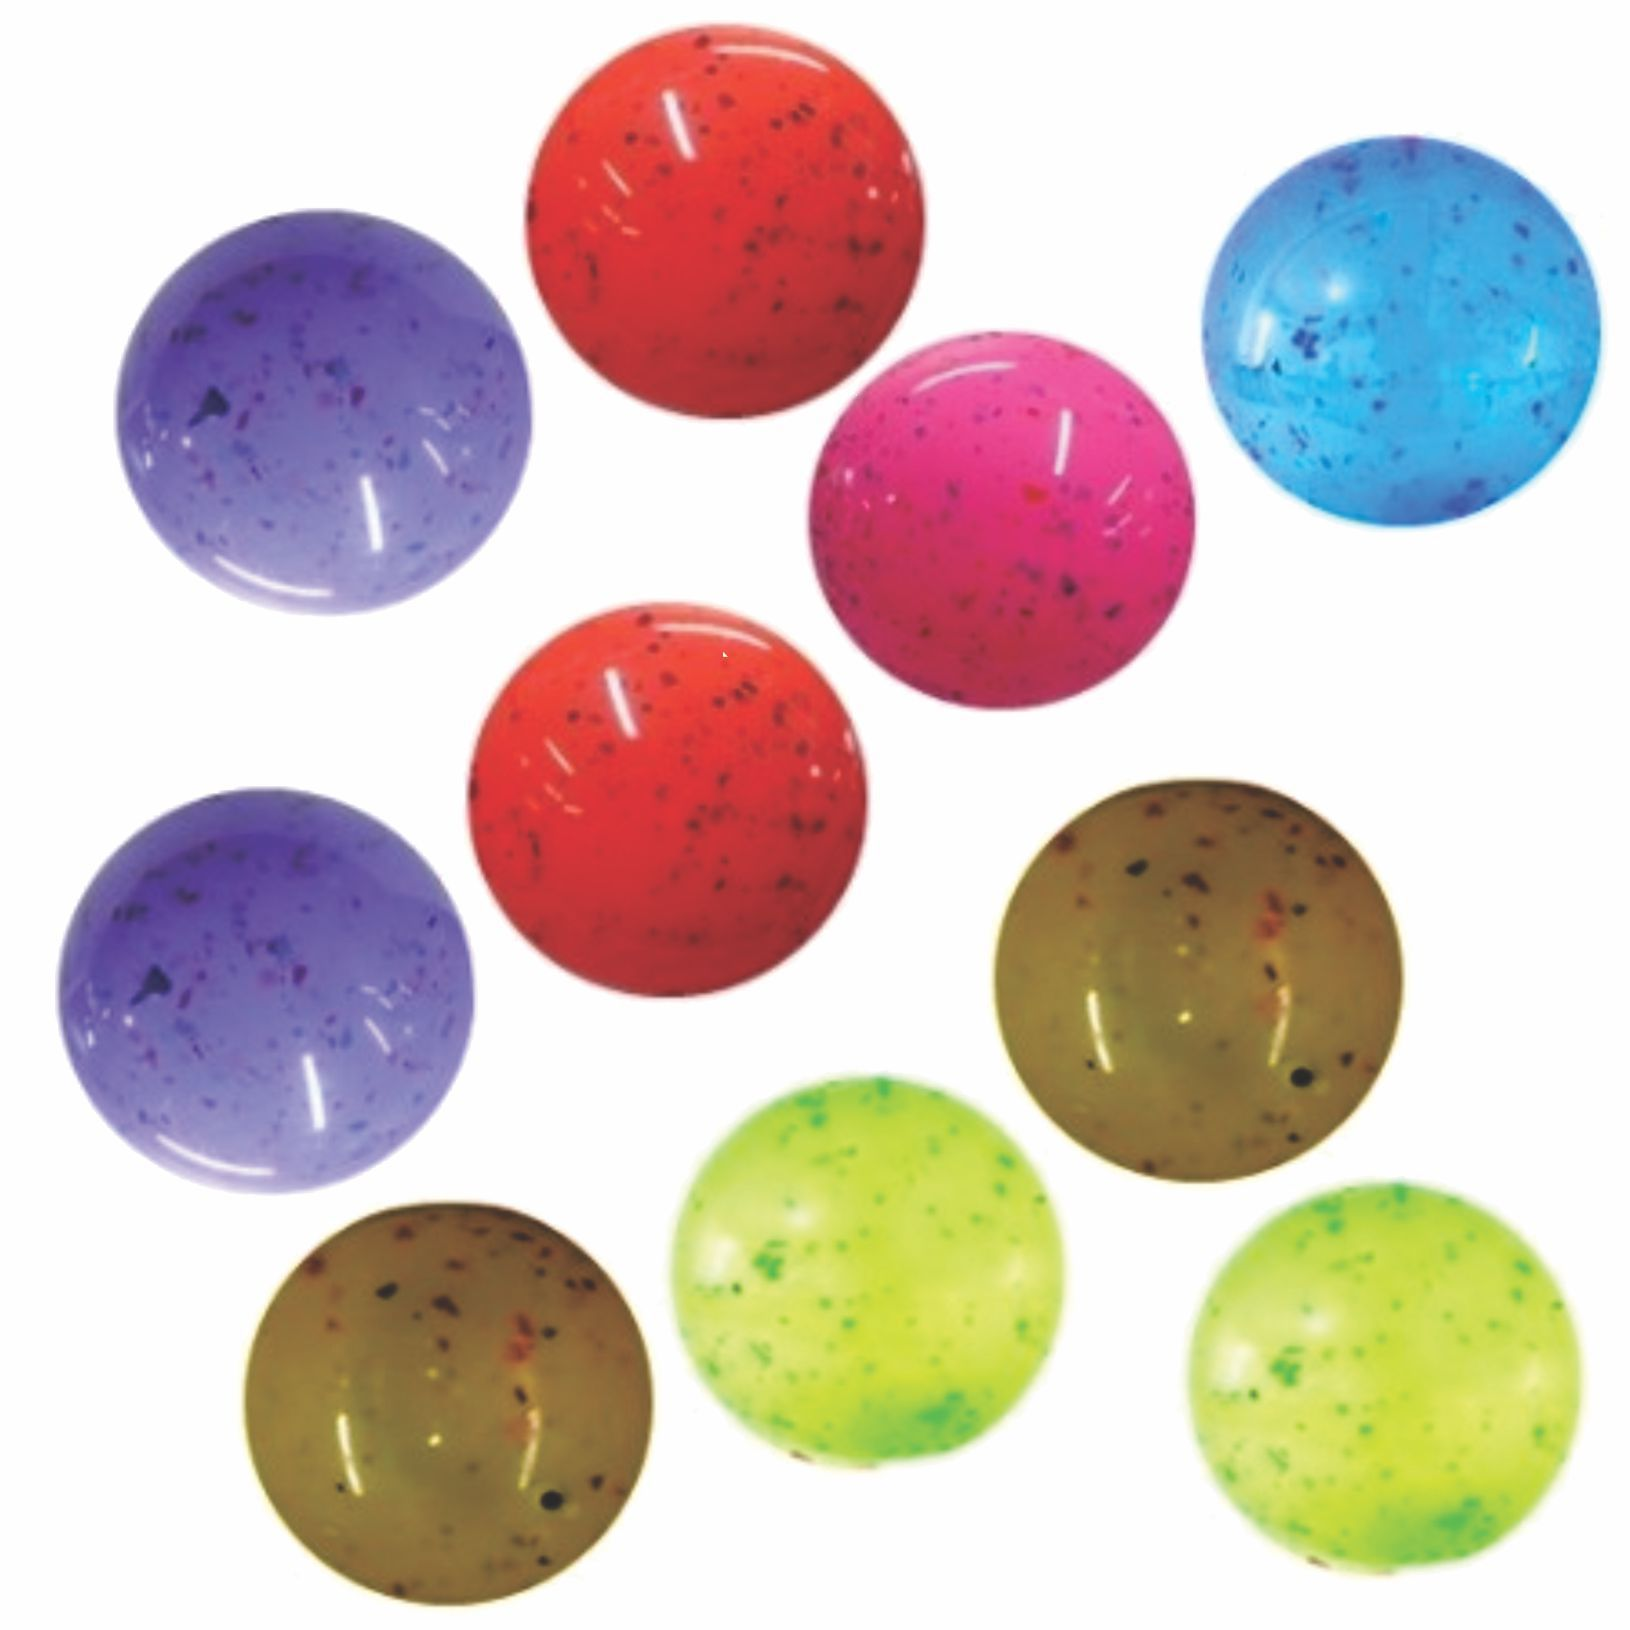 10 Bolas Confete Vinil Cores Sortidas Super Diversão Super Leve